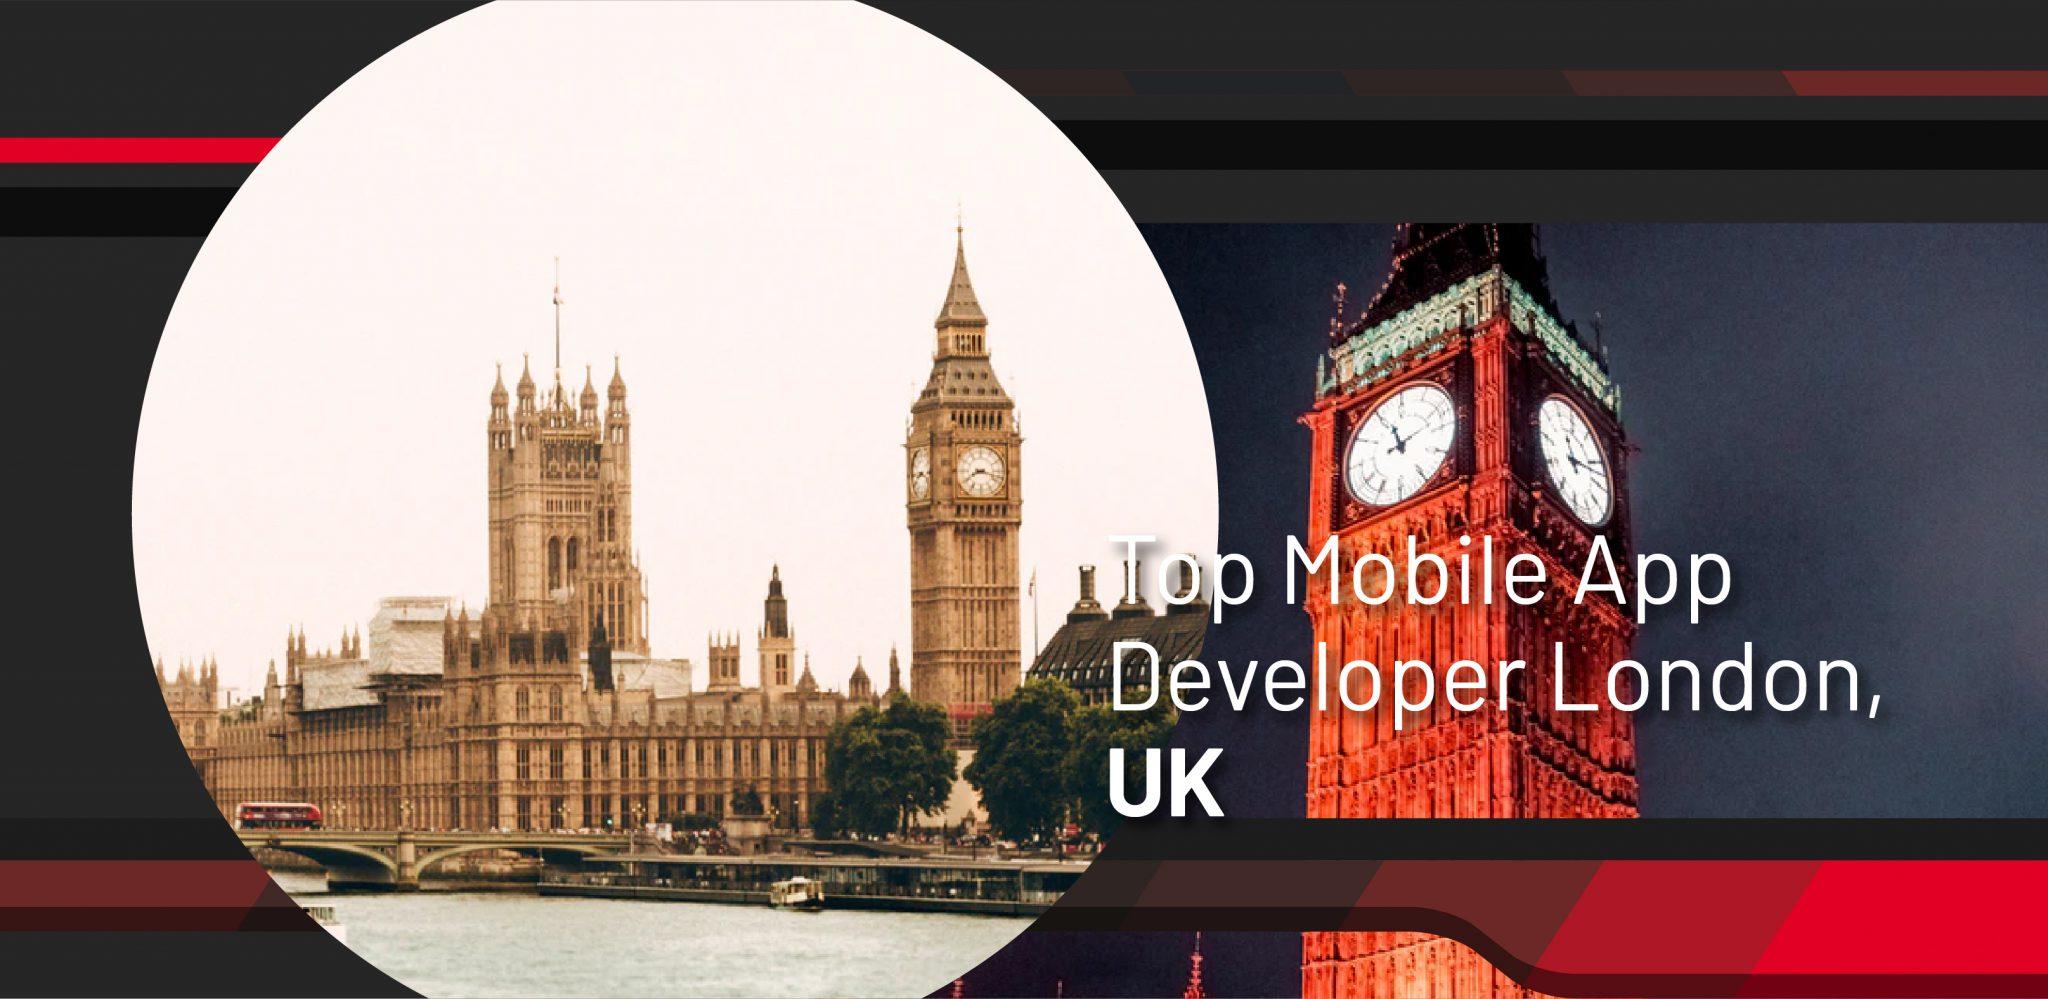 Best Mobile App Development Agency United States - WebClues Infotech